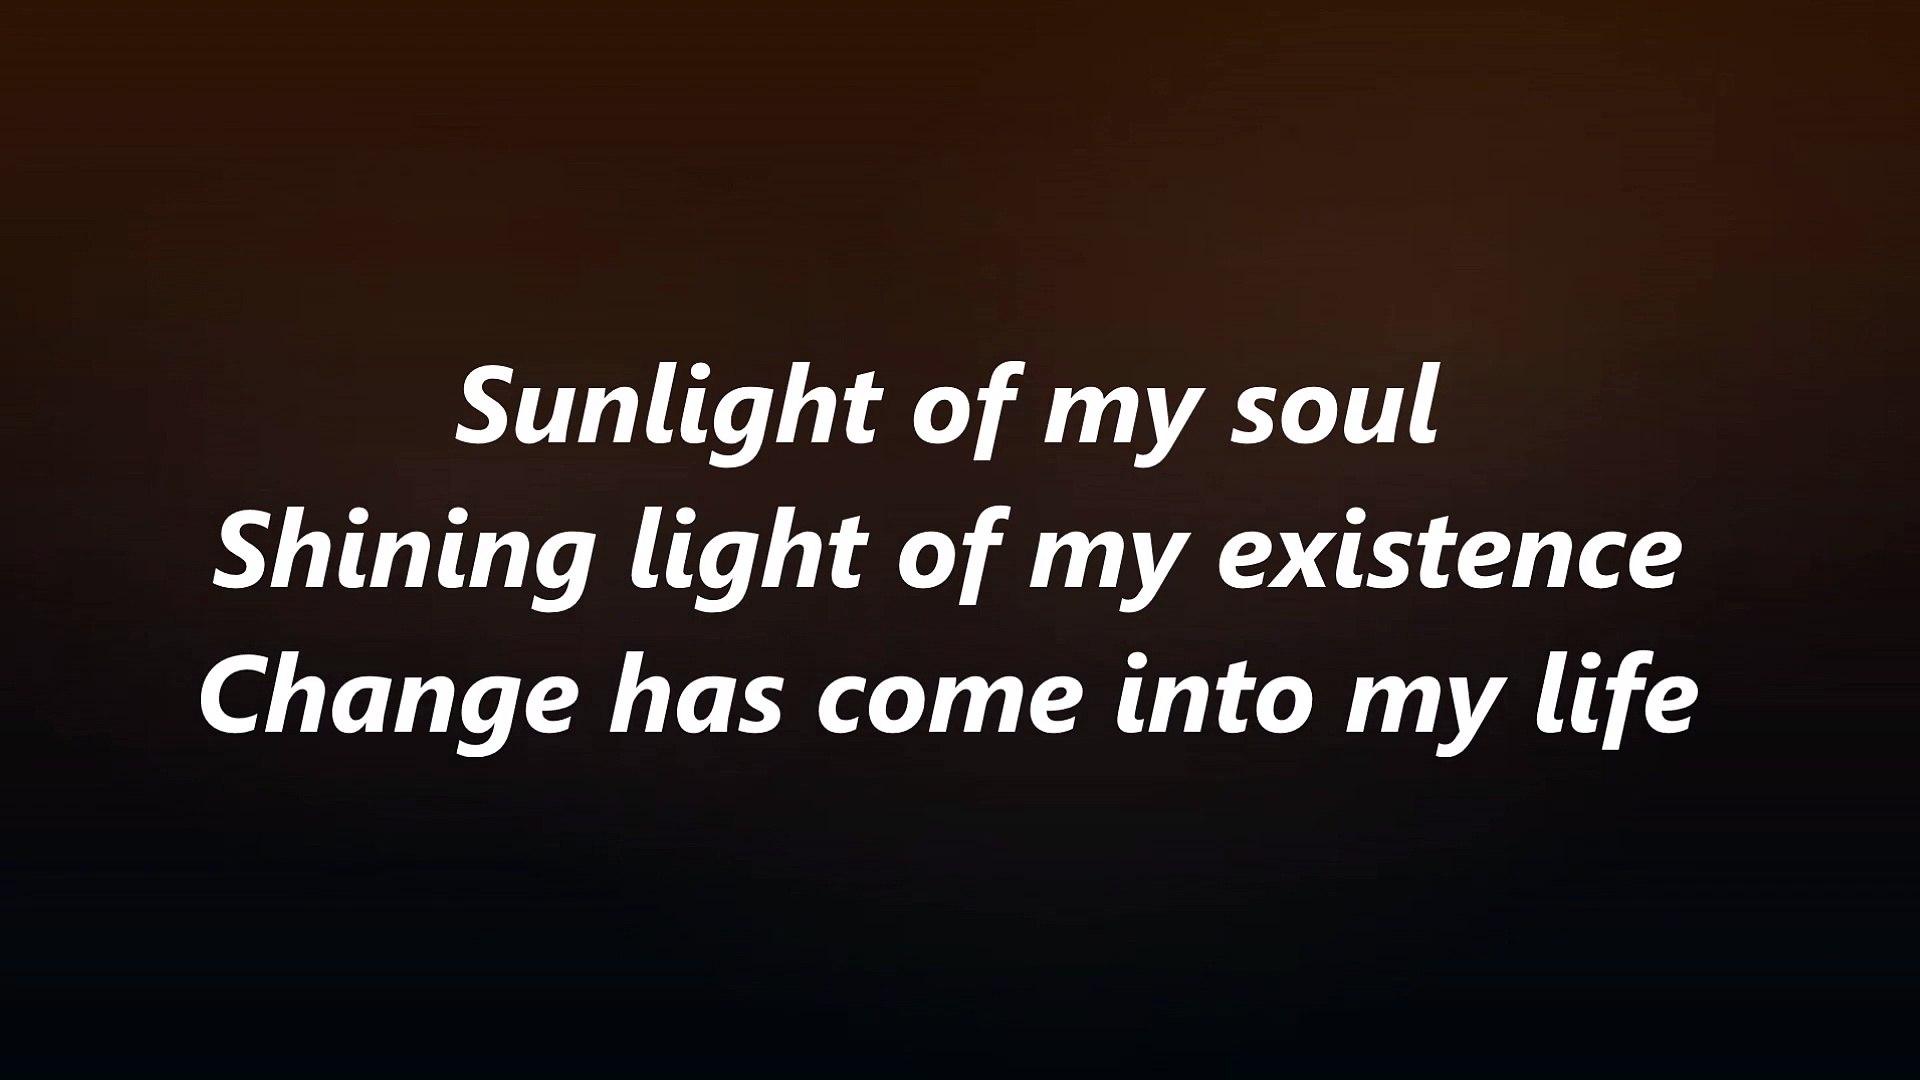 Sunlight of my Soul - Kolade Olamide